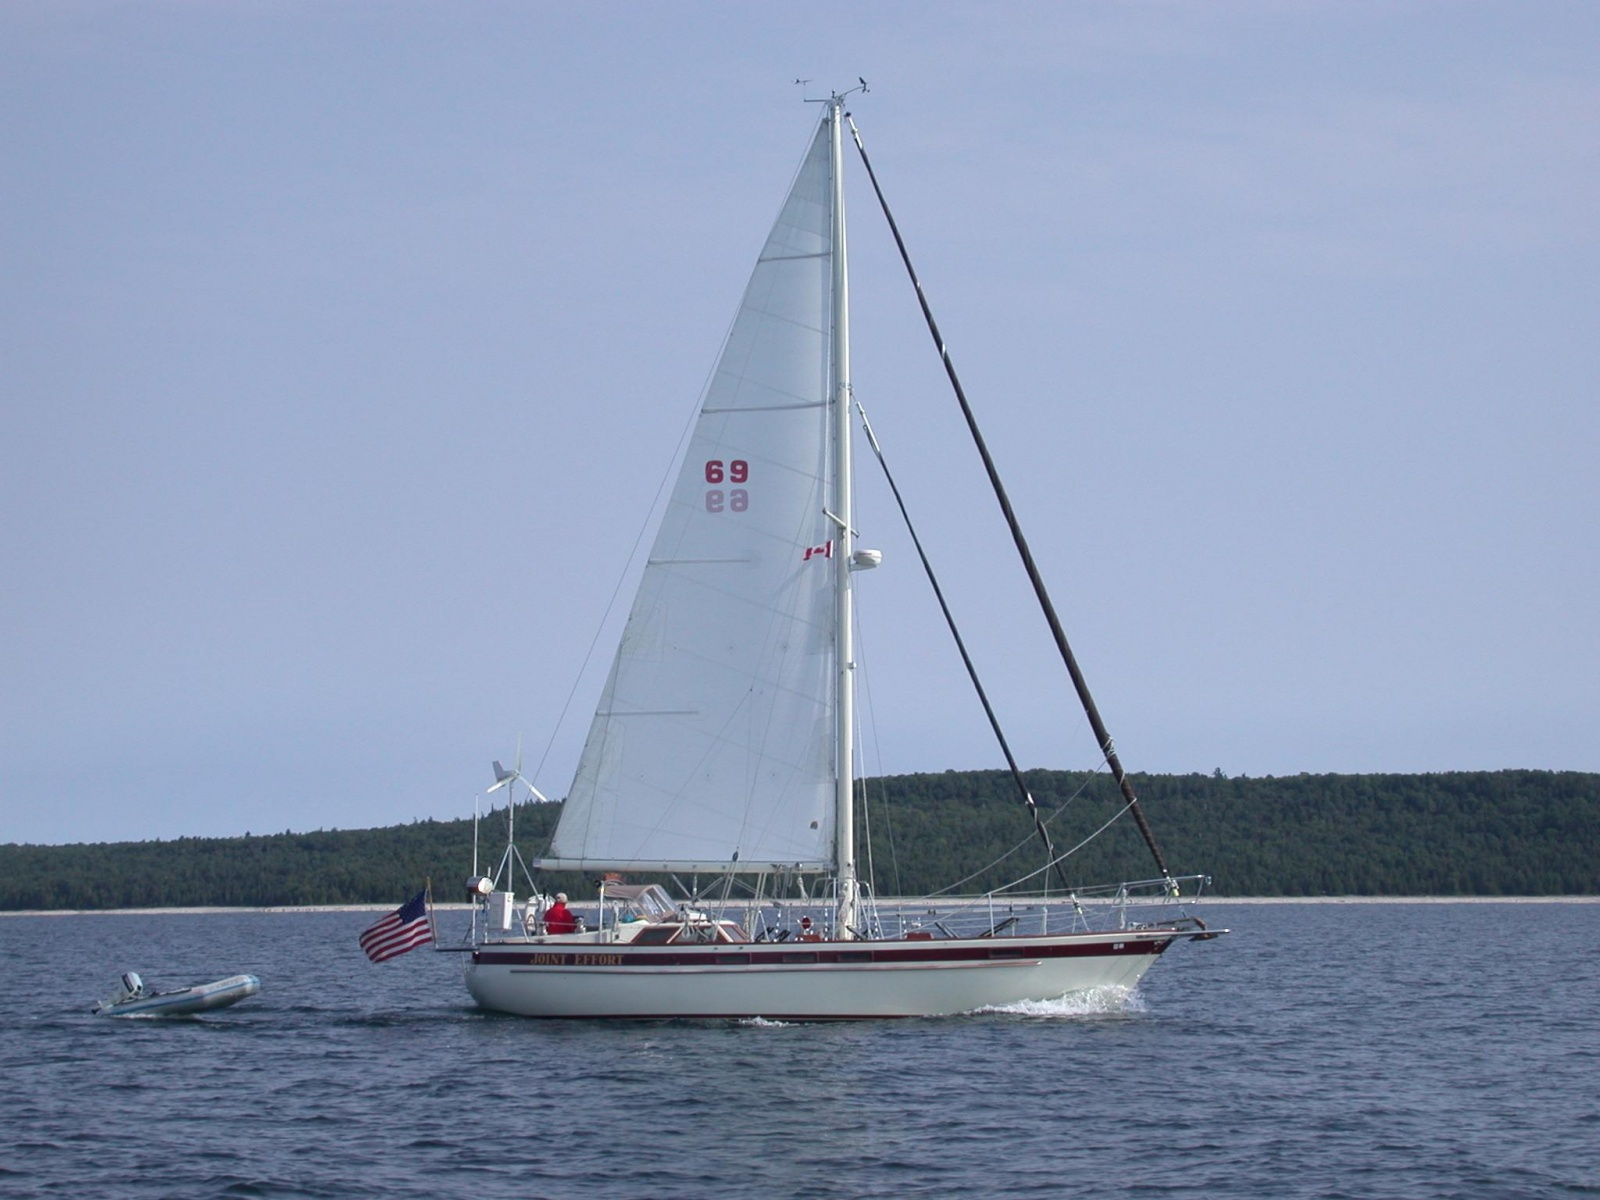 Click image for larger version  Name:JE mainsail at sea.jpg Views:1171 Size:383.6 KB ID:52006